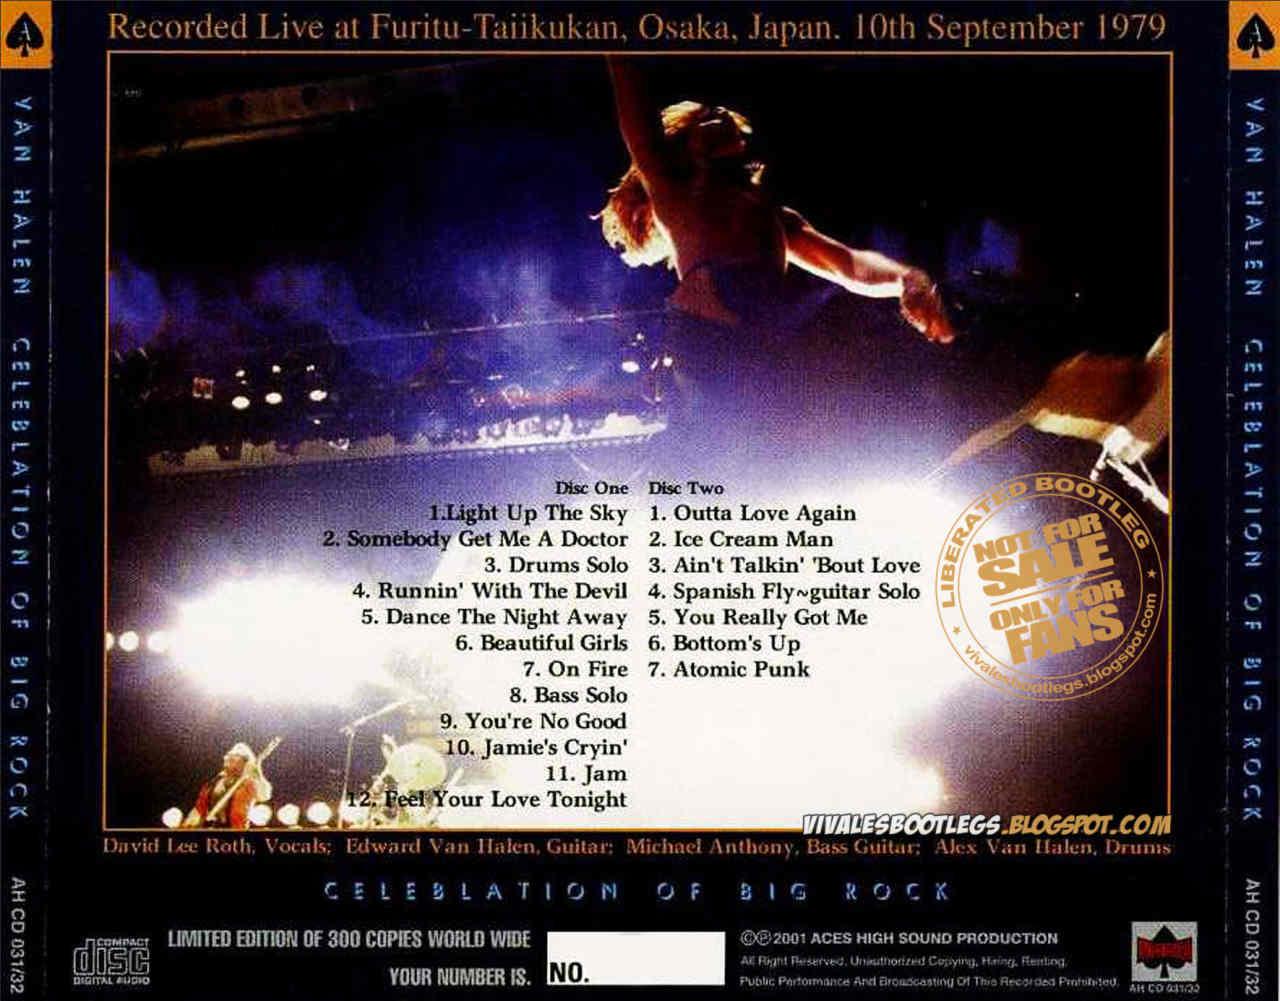 Van Halen: Celeblation Of Big Rock  Furitu Taiikukan, Osaka